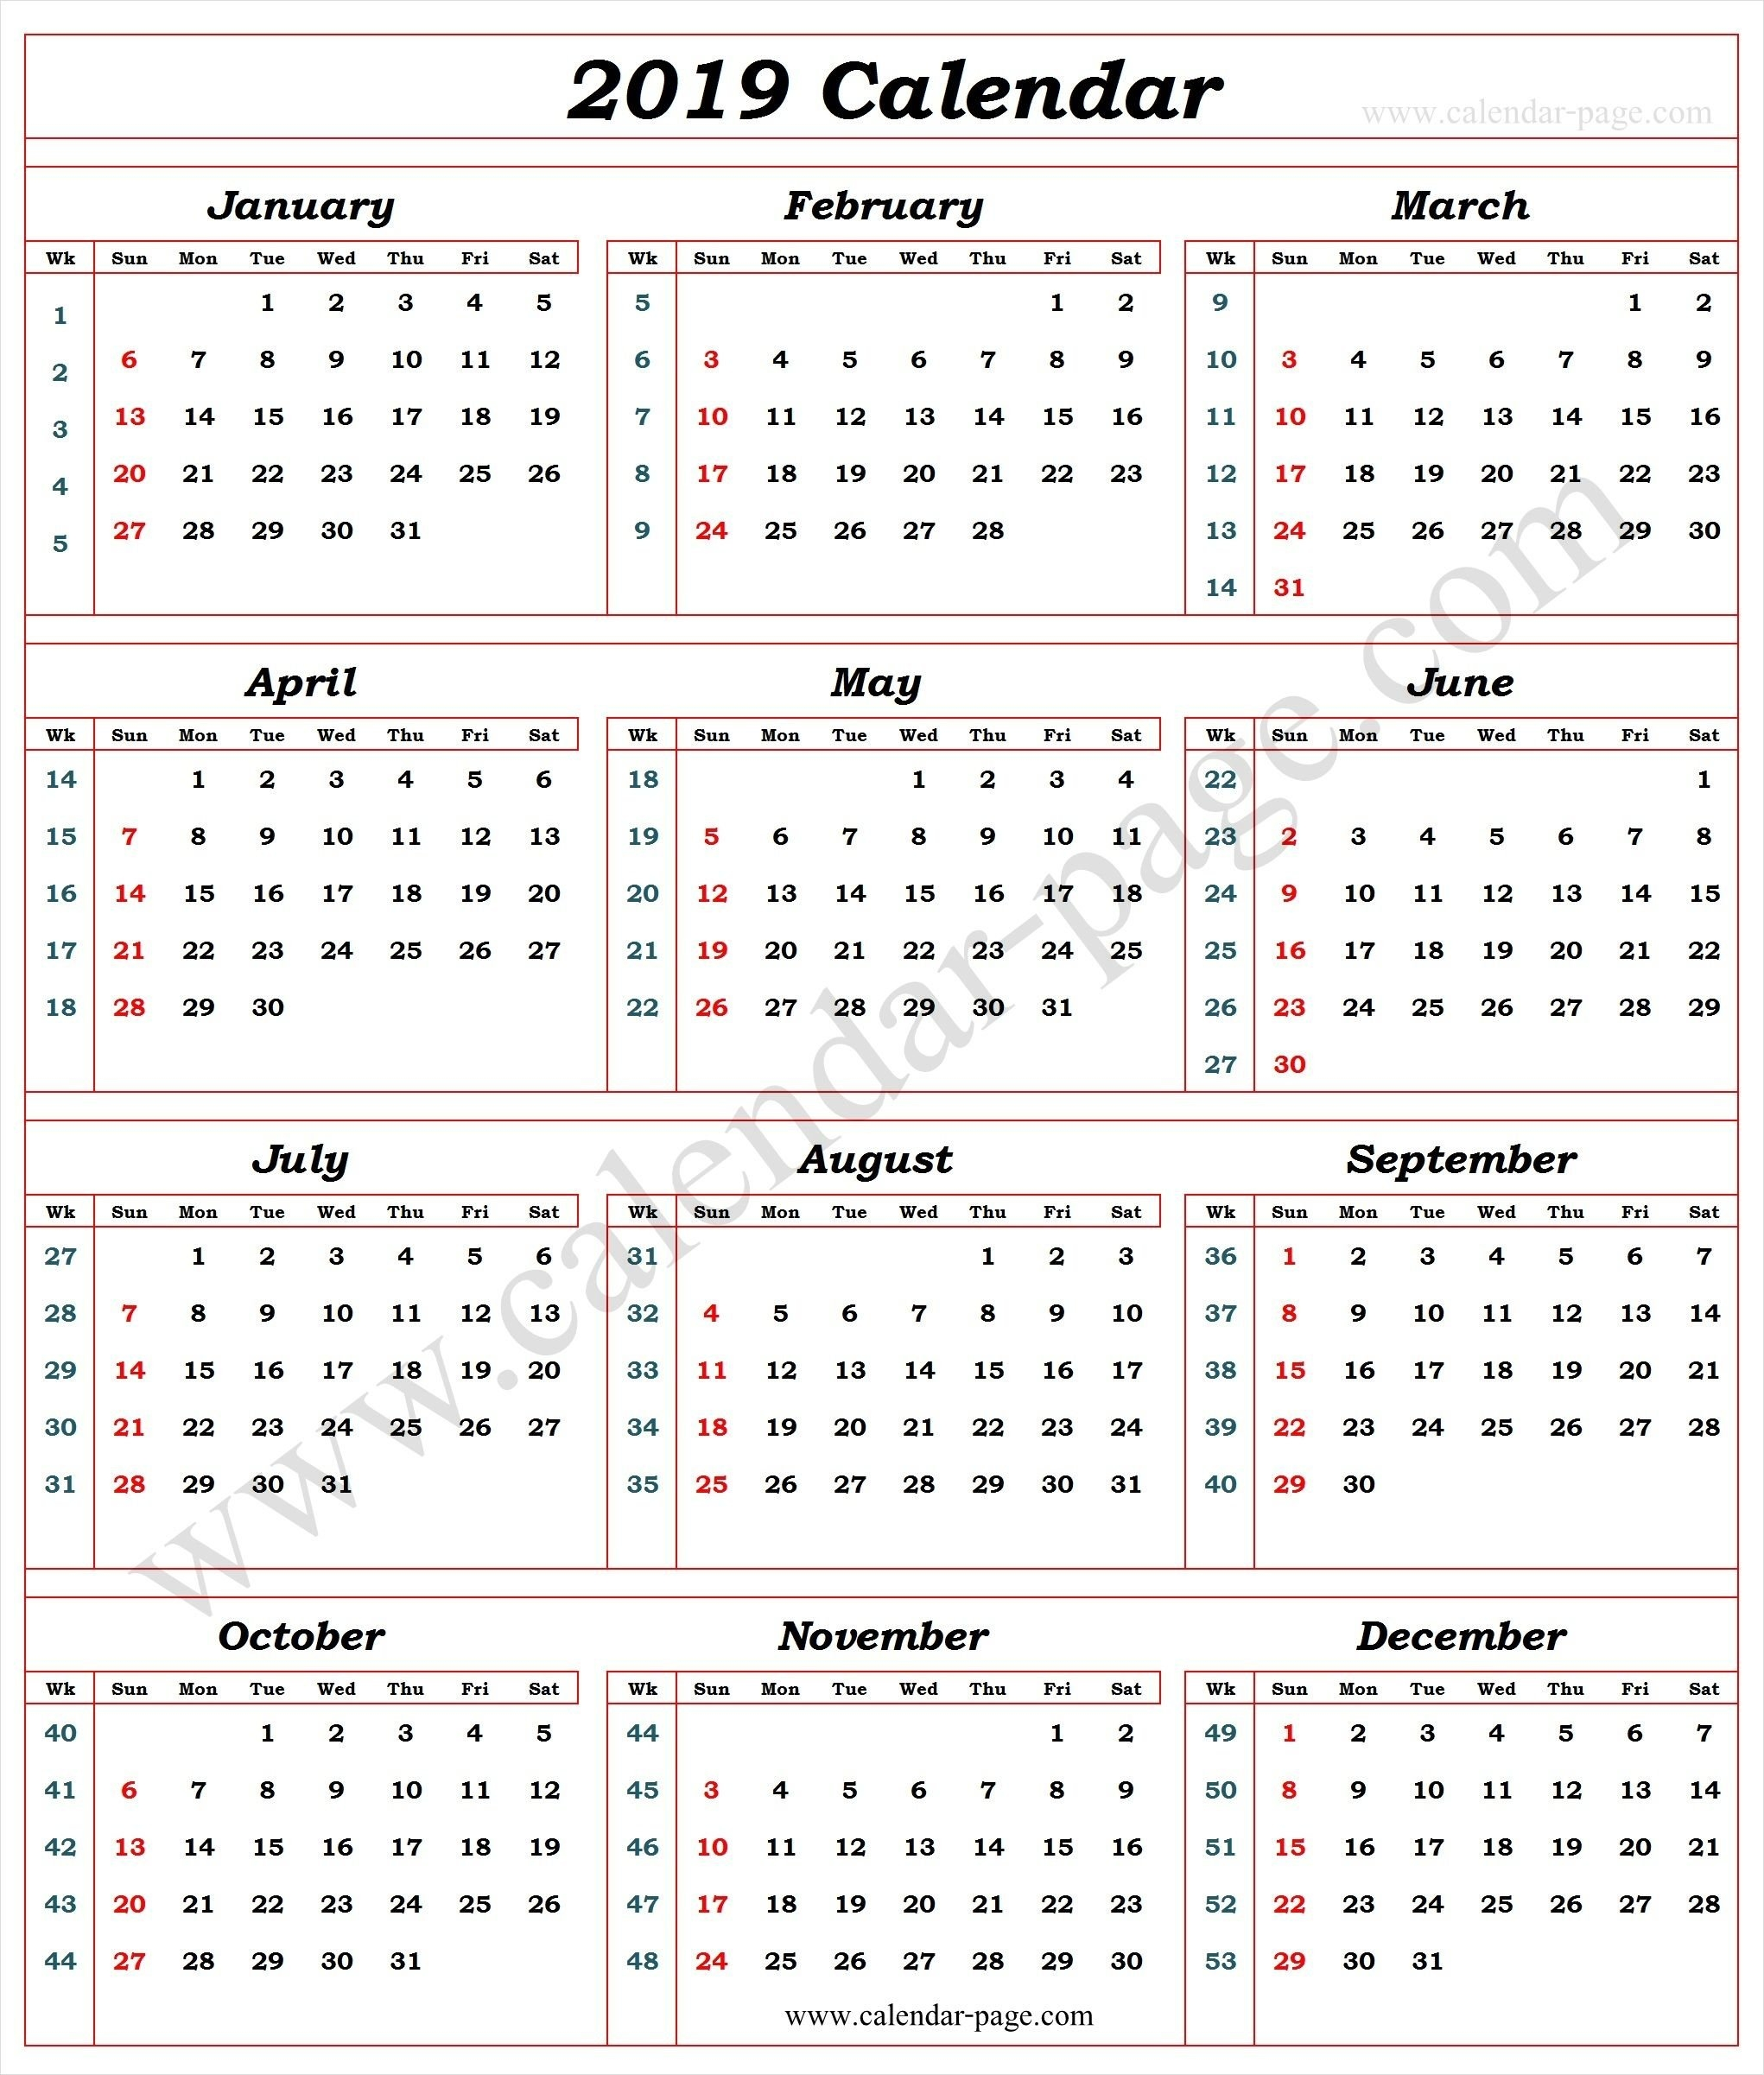 Calendar 2019 With Week Numbers | 2019 Calendar Template | Pinterest Calendar Week 4 2019